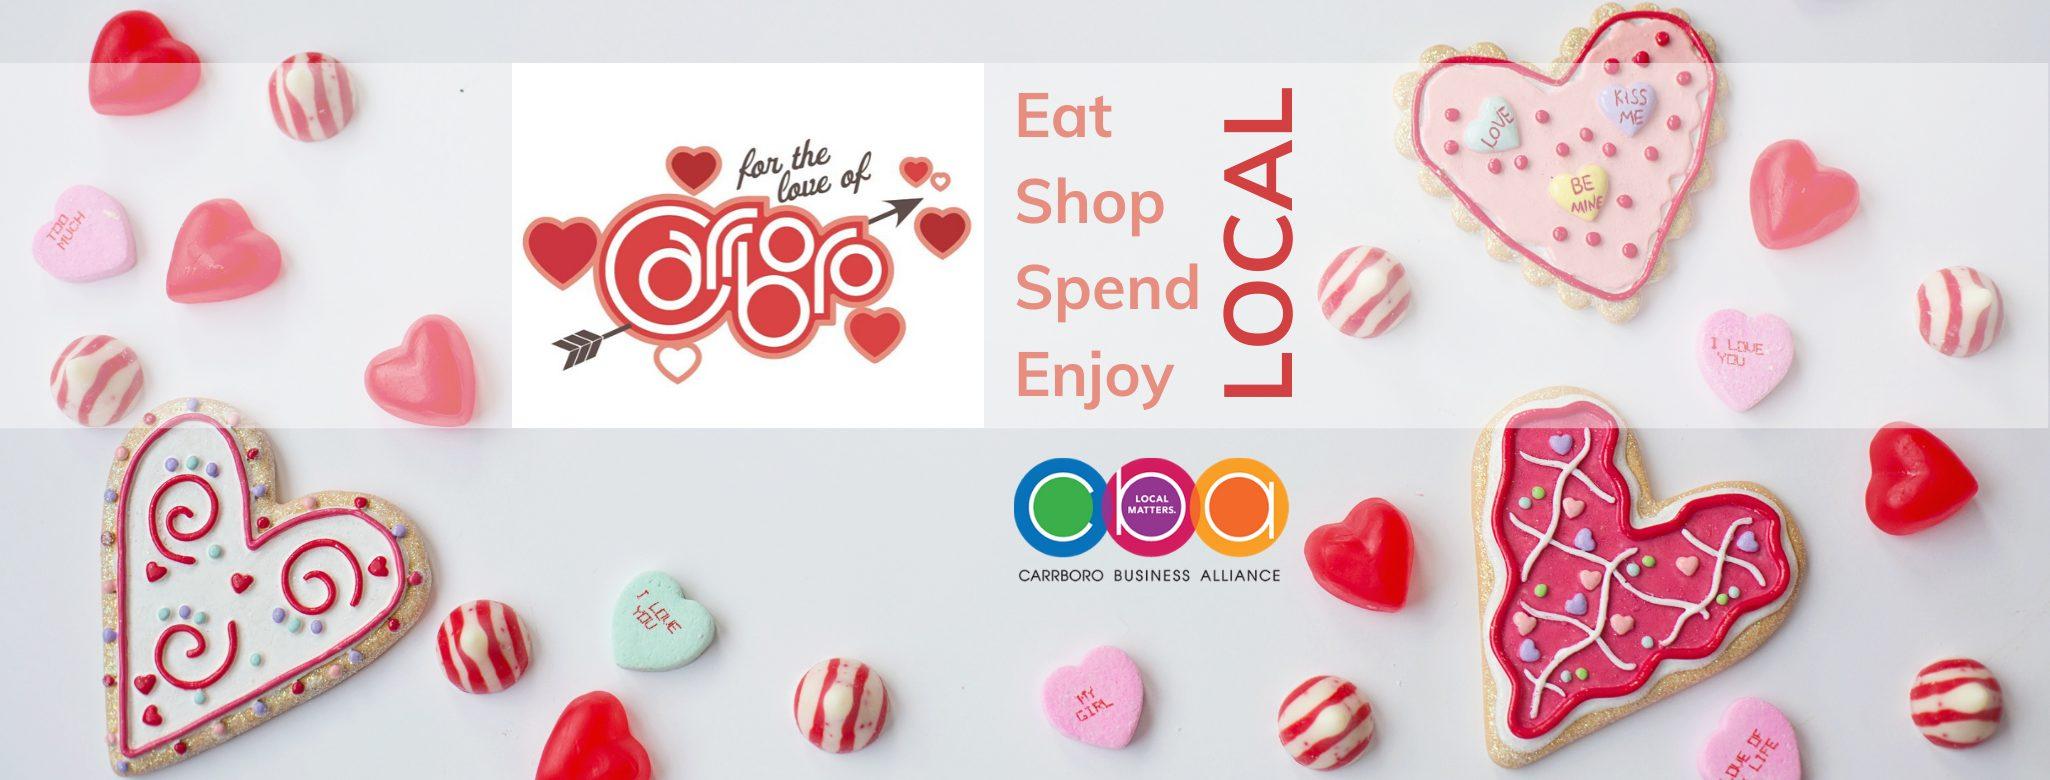 Eat Shop Spend Enjoy (5)